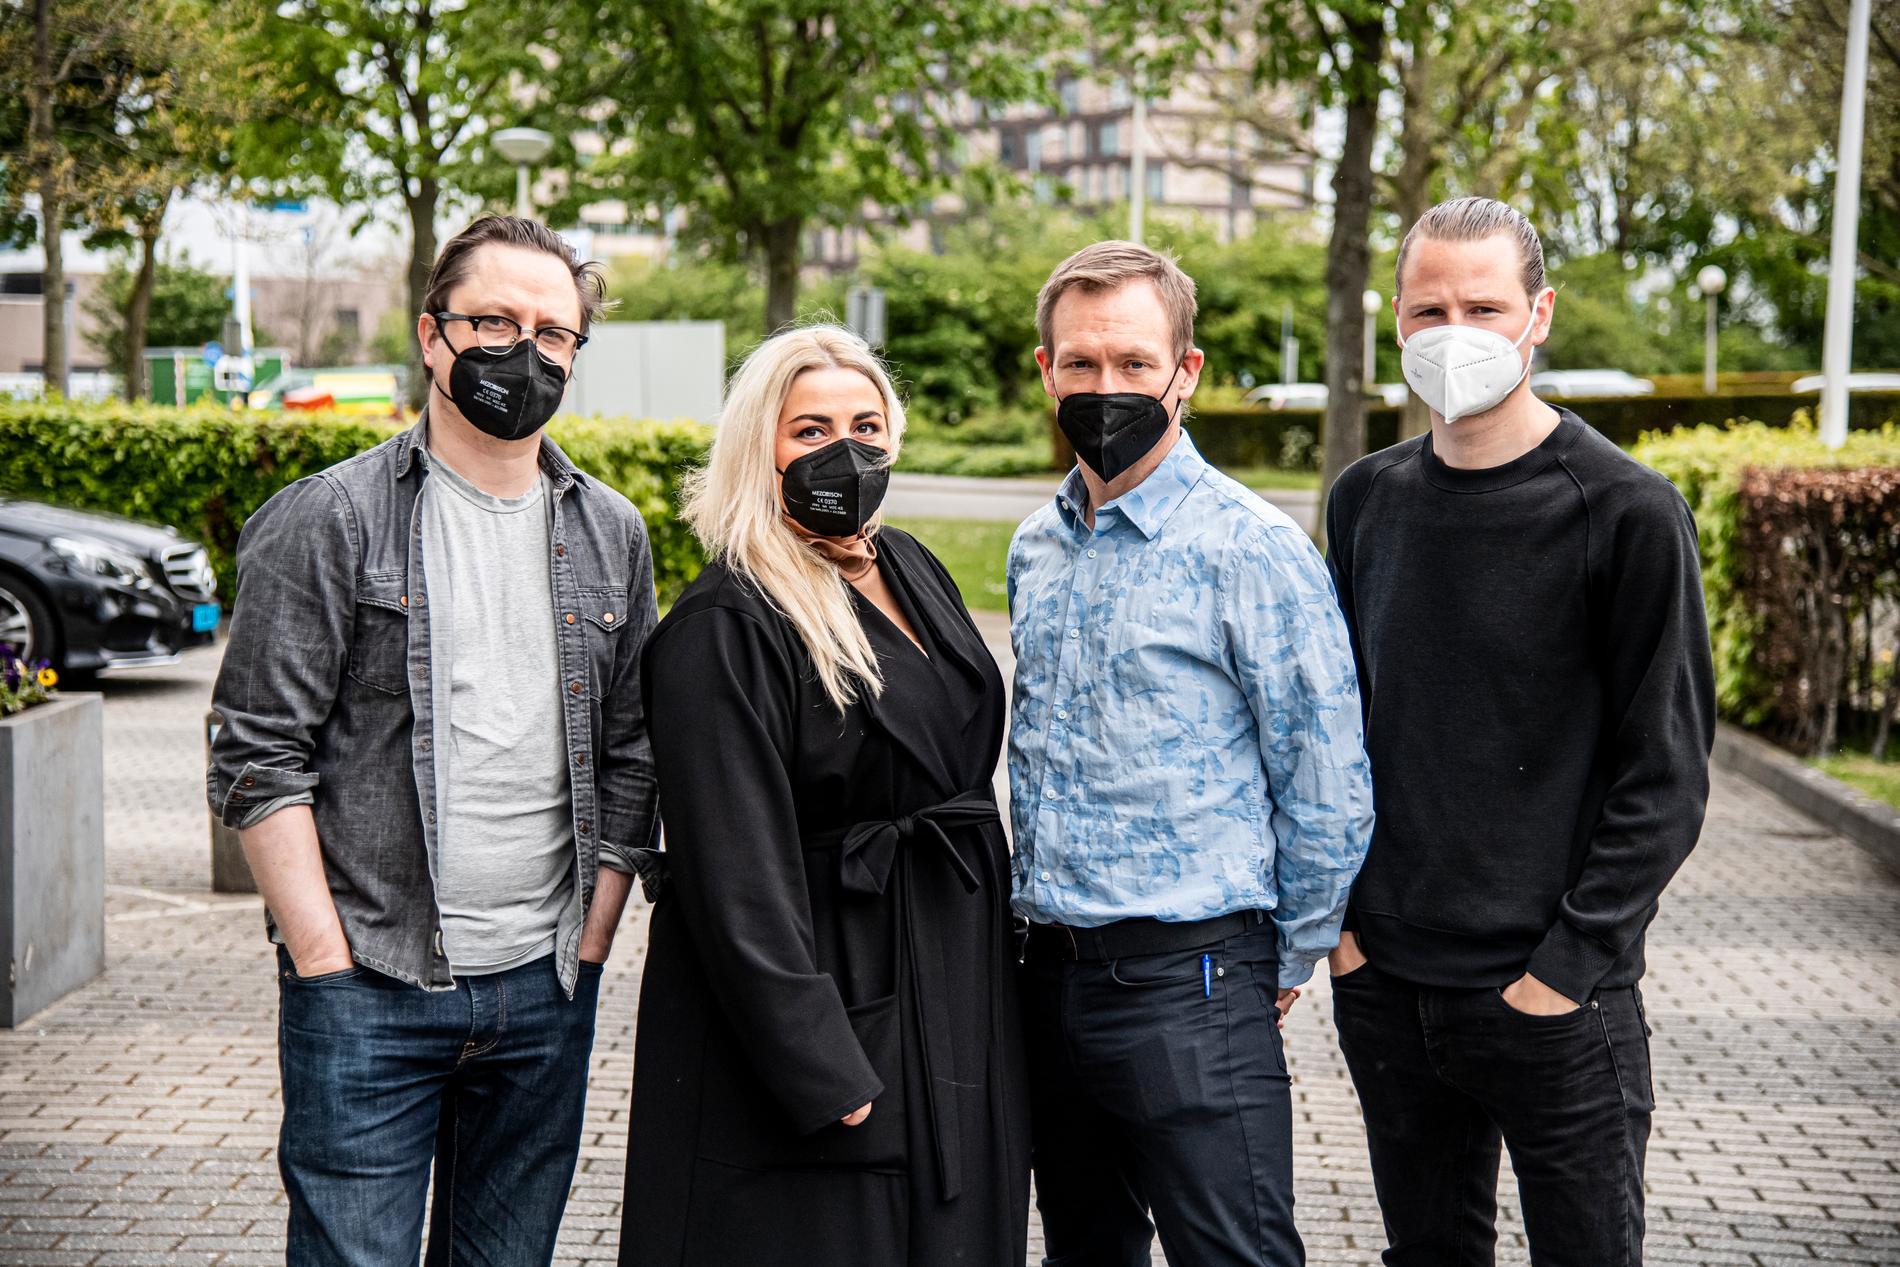 Aftonbladets reportrar Markus Larsson, Natalie Demirian, Torbjörn Ek och Robin Lorentz-Allard.